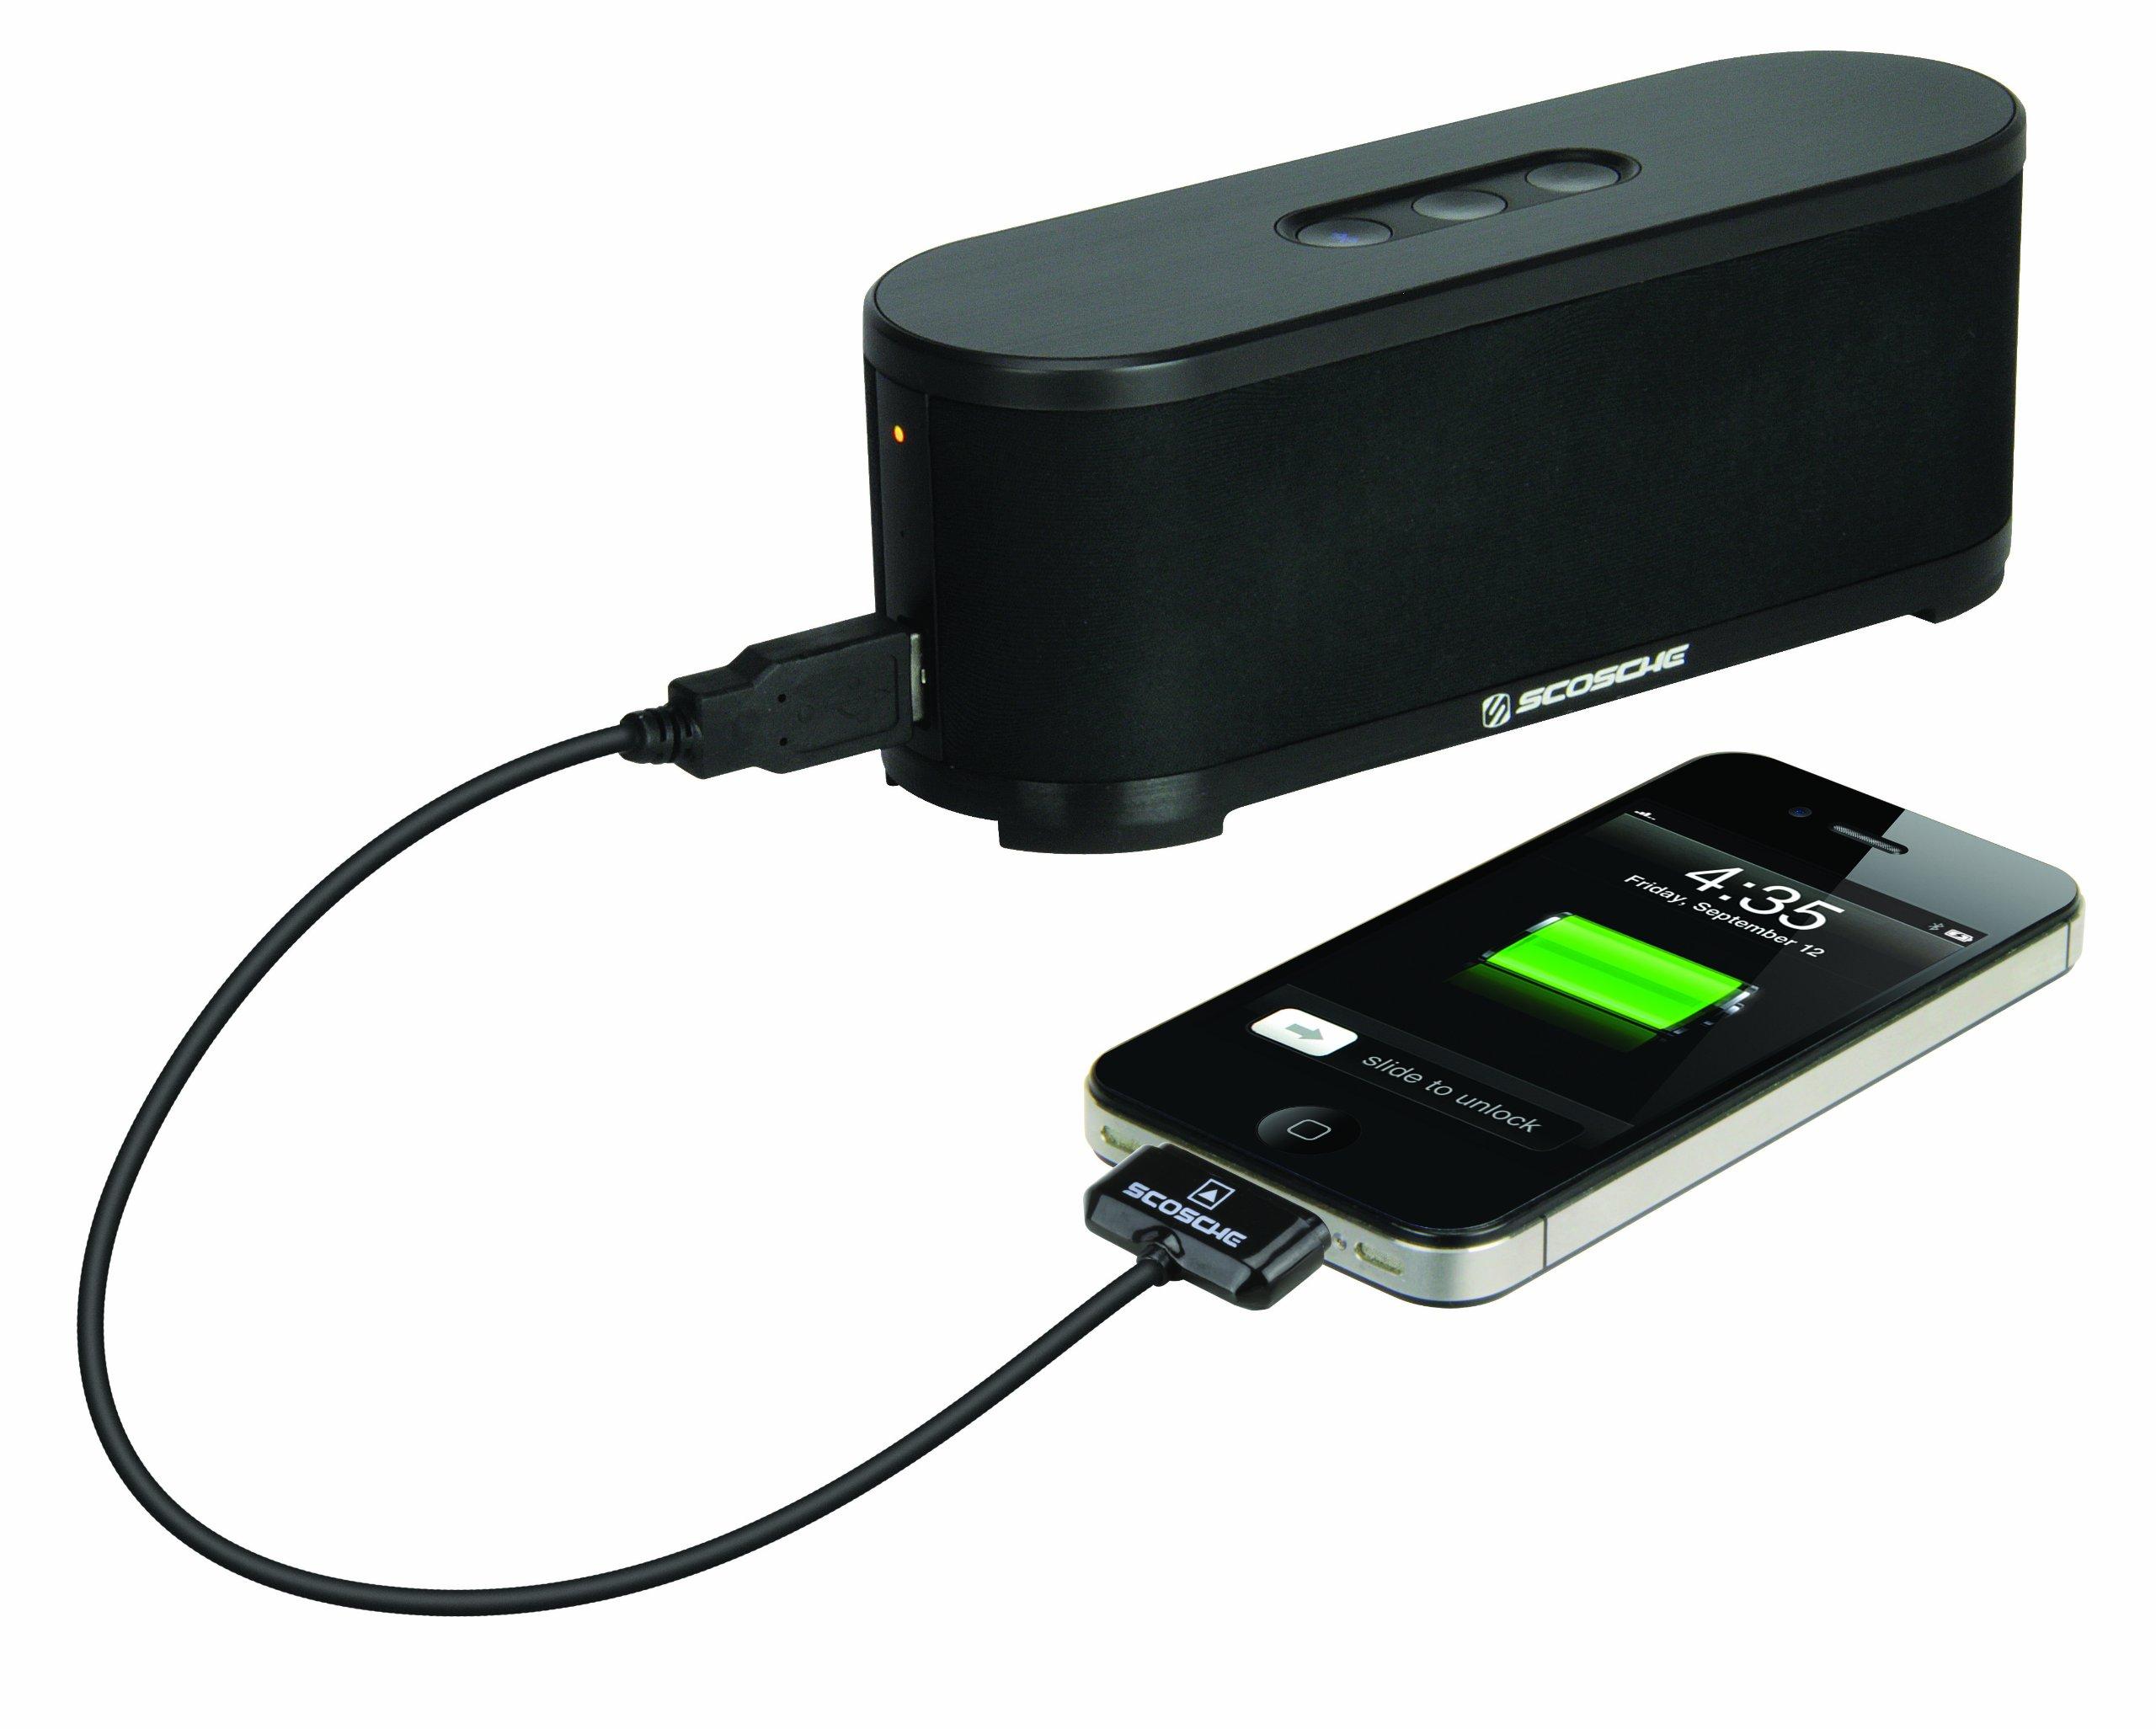 Scosche btspk2 boomSTREAM Bluetooth Media Speaker - Bluetooth Car Kit - Retail Packaging - Black